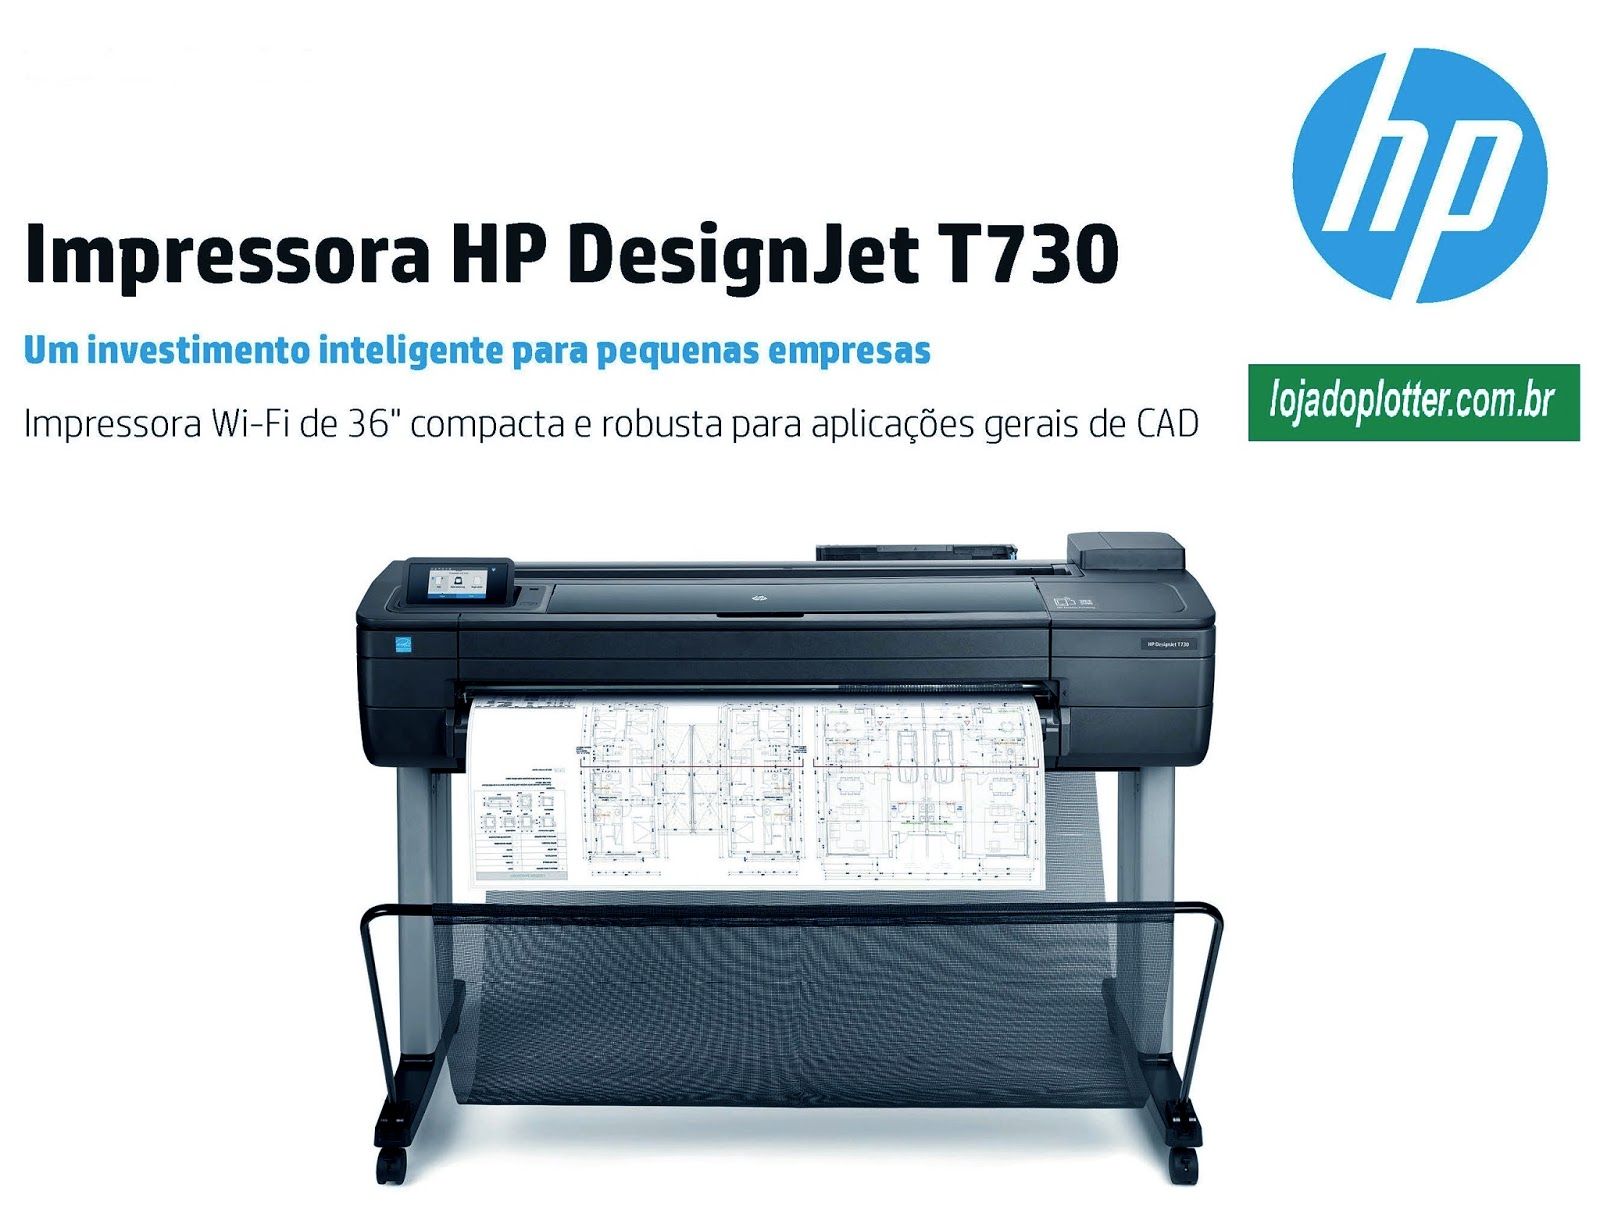 plotter HP Designjet T730formato A0 vendido pela loja do plotter